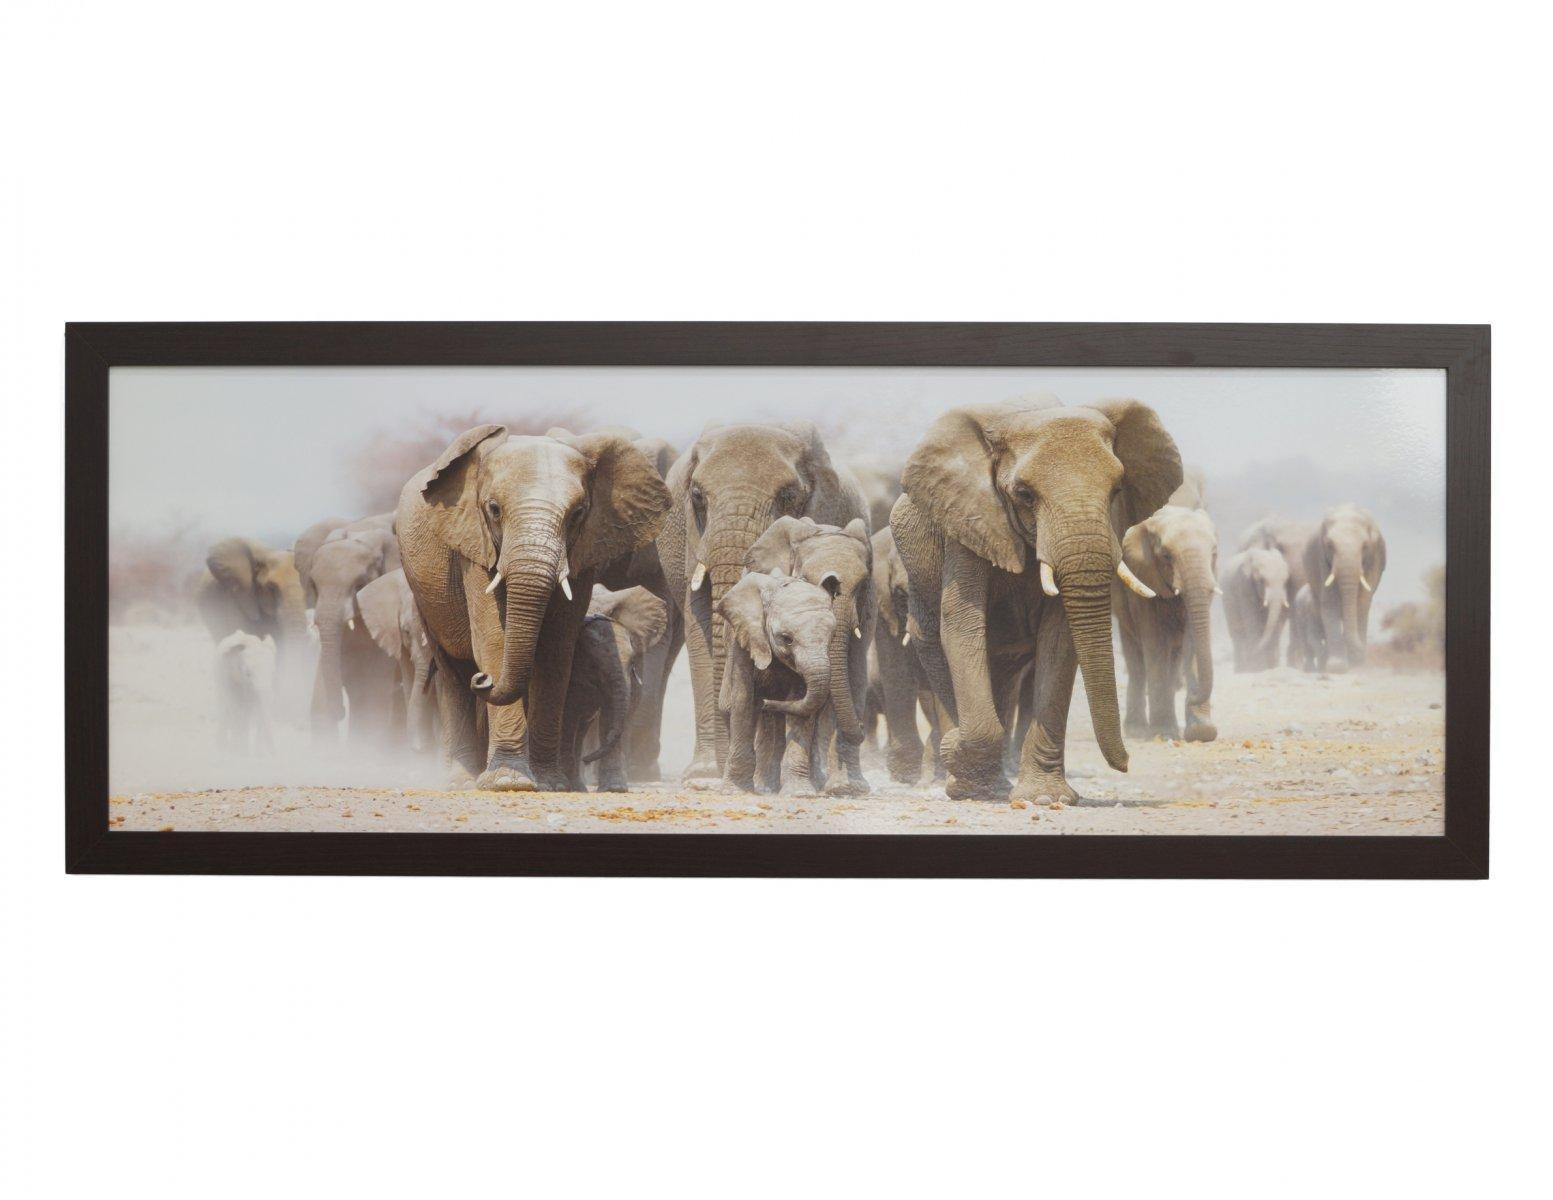 Obraz slonie afrykanskie